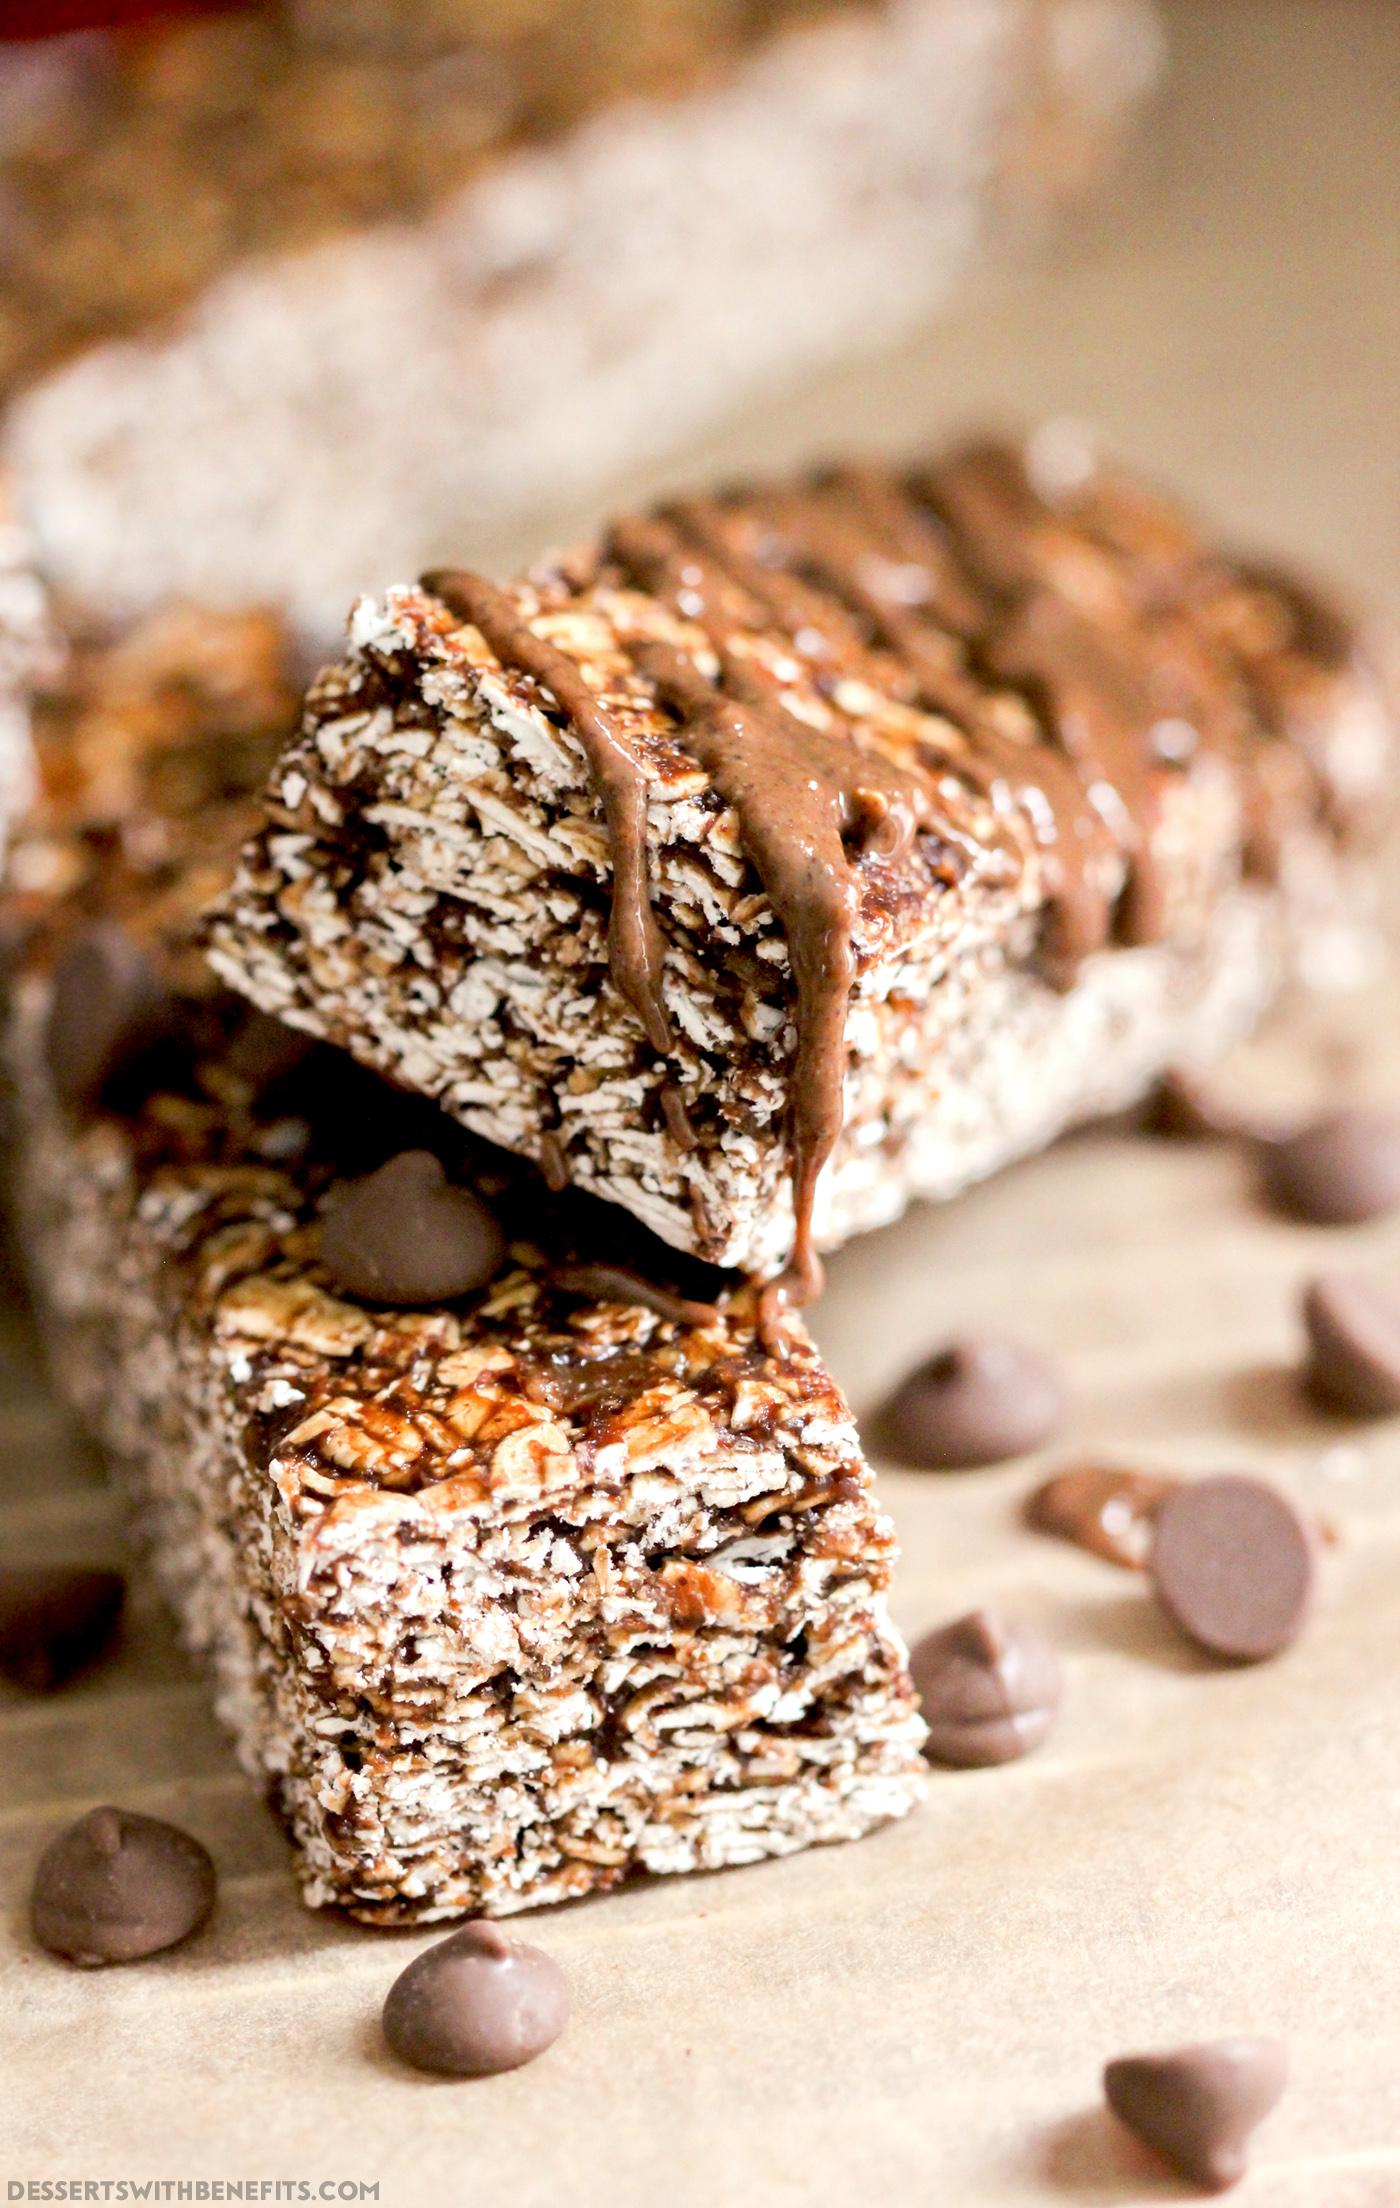 15 Healthy Nutella Recipes | Healthy No-Bake Nutella Granola Bars (refined sugar free, high protein, high fiber, gluten free) - Healthy Dessert Recipes at Desserts with Benefits